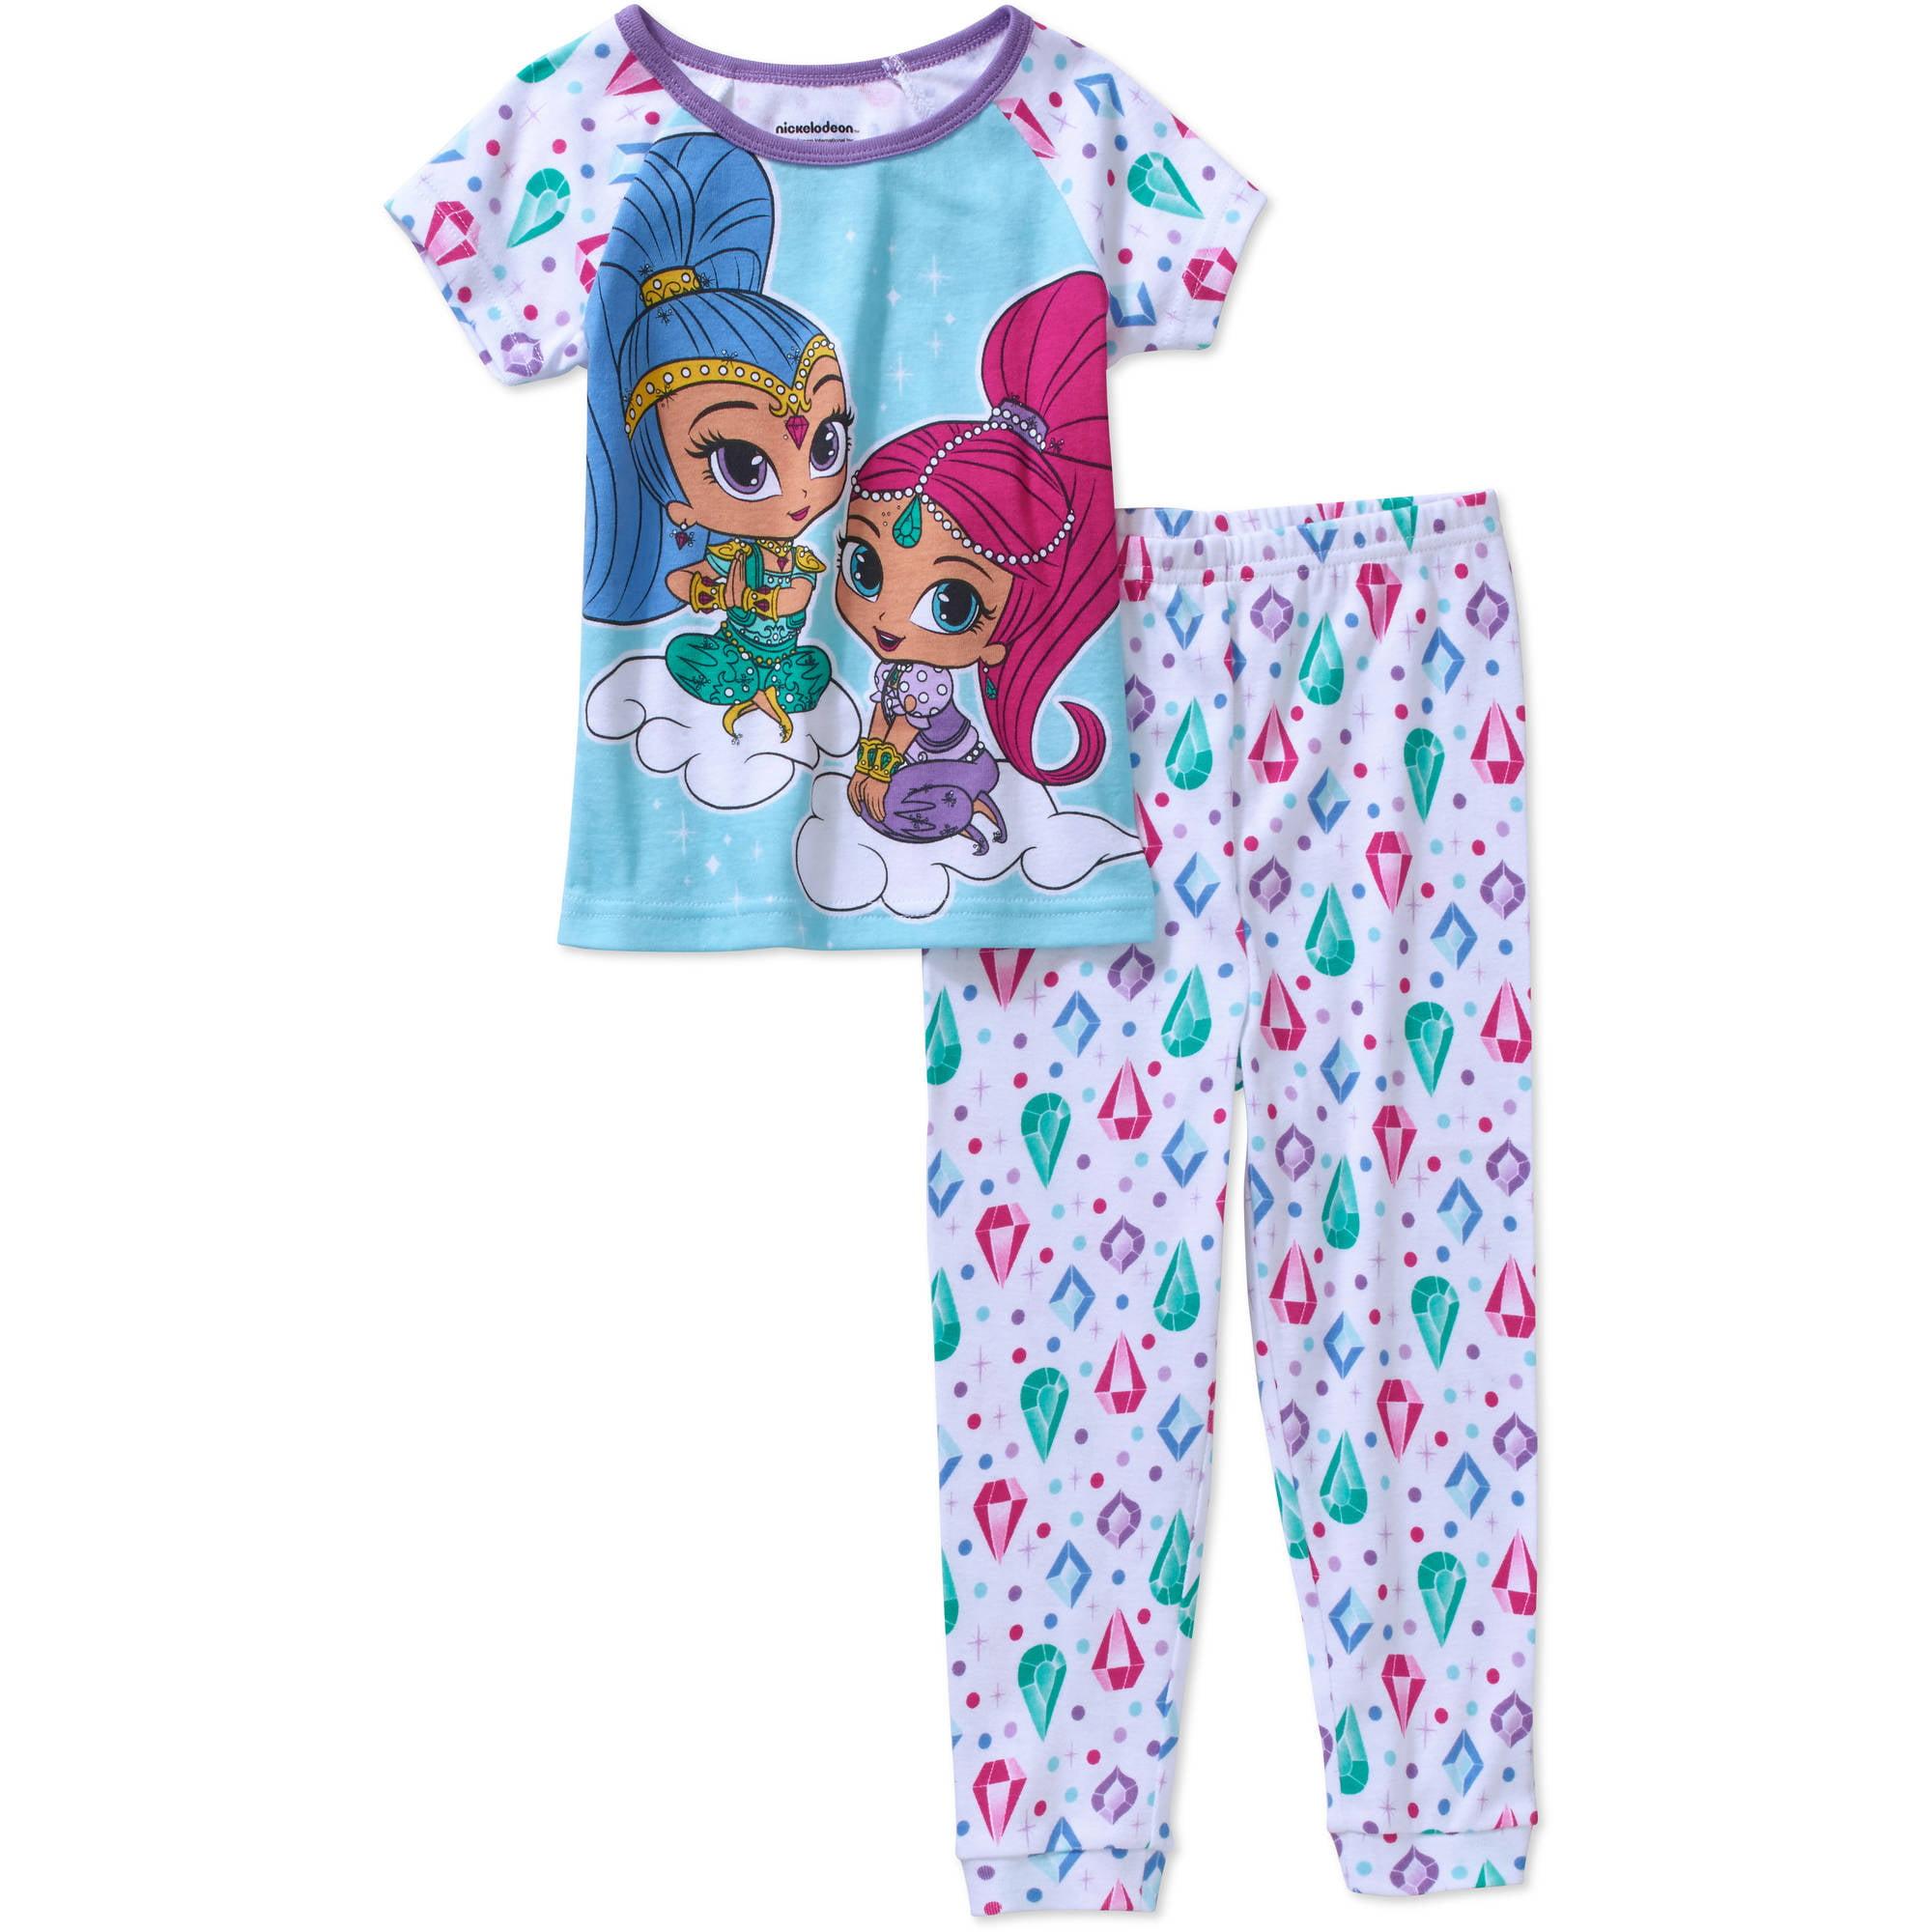 Shimmer And Shine Toddler Girls' Licensed Cotton Pajama Sleepwear Set